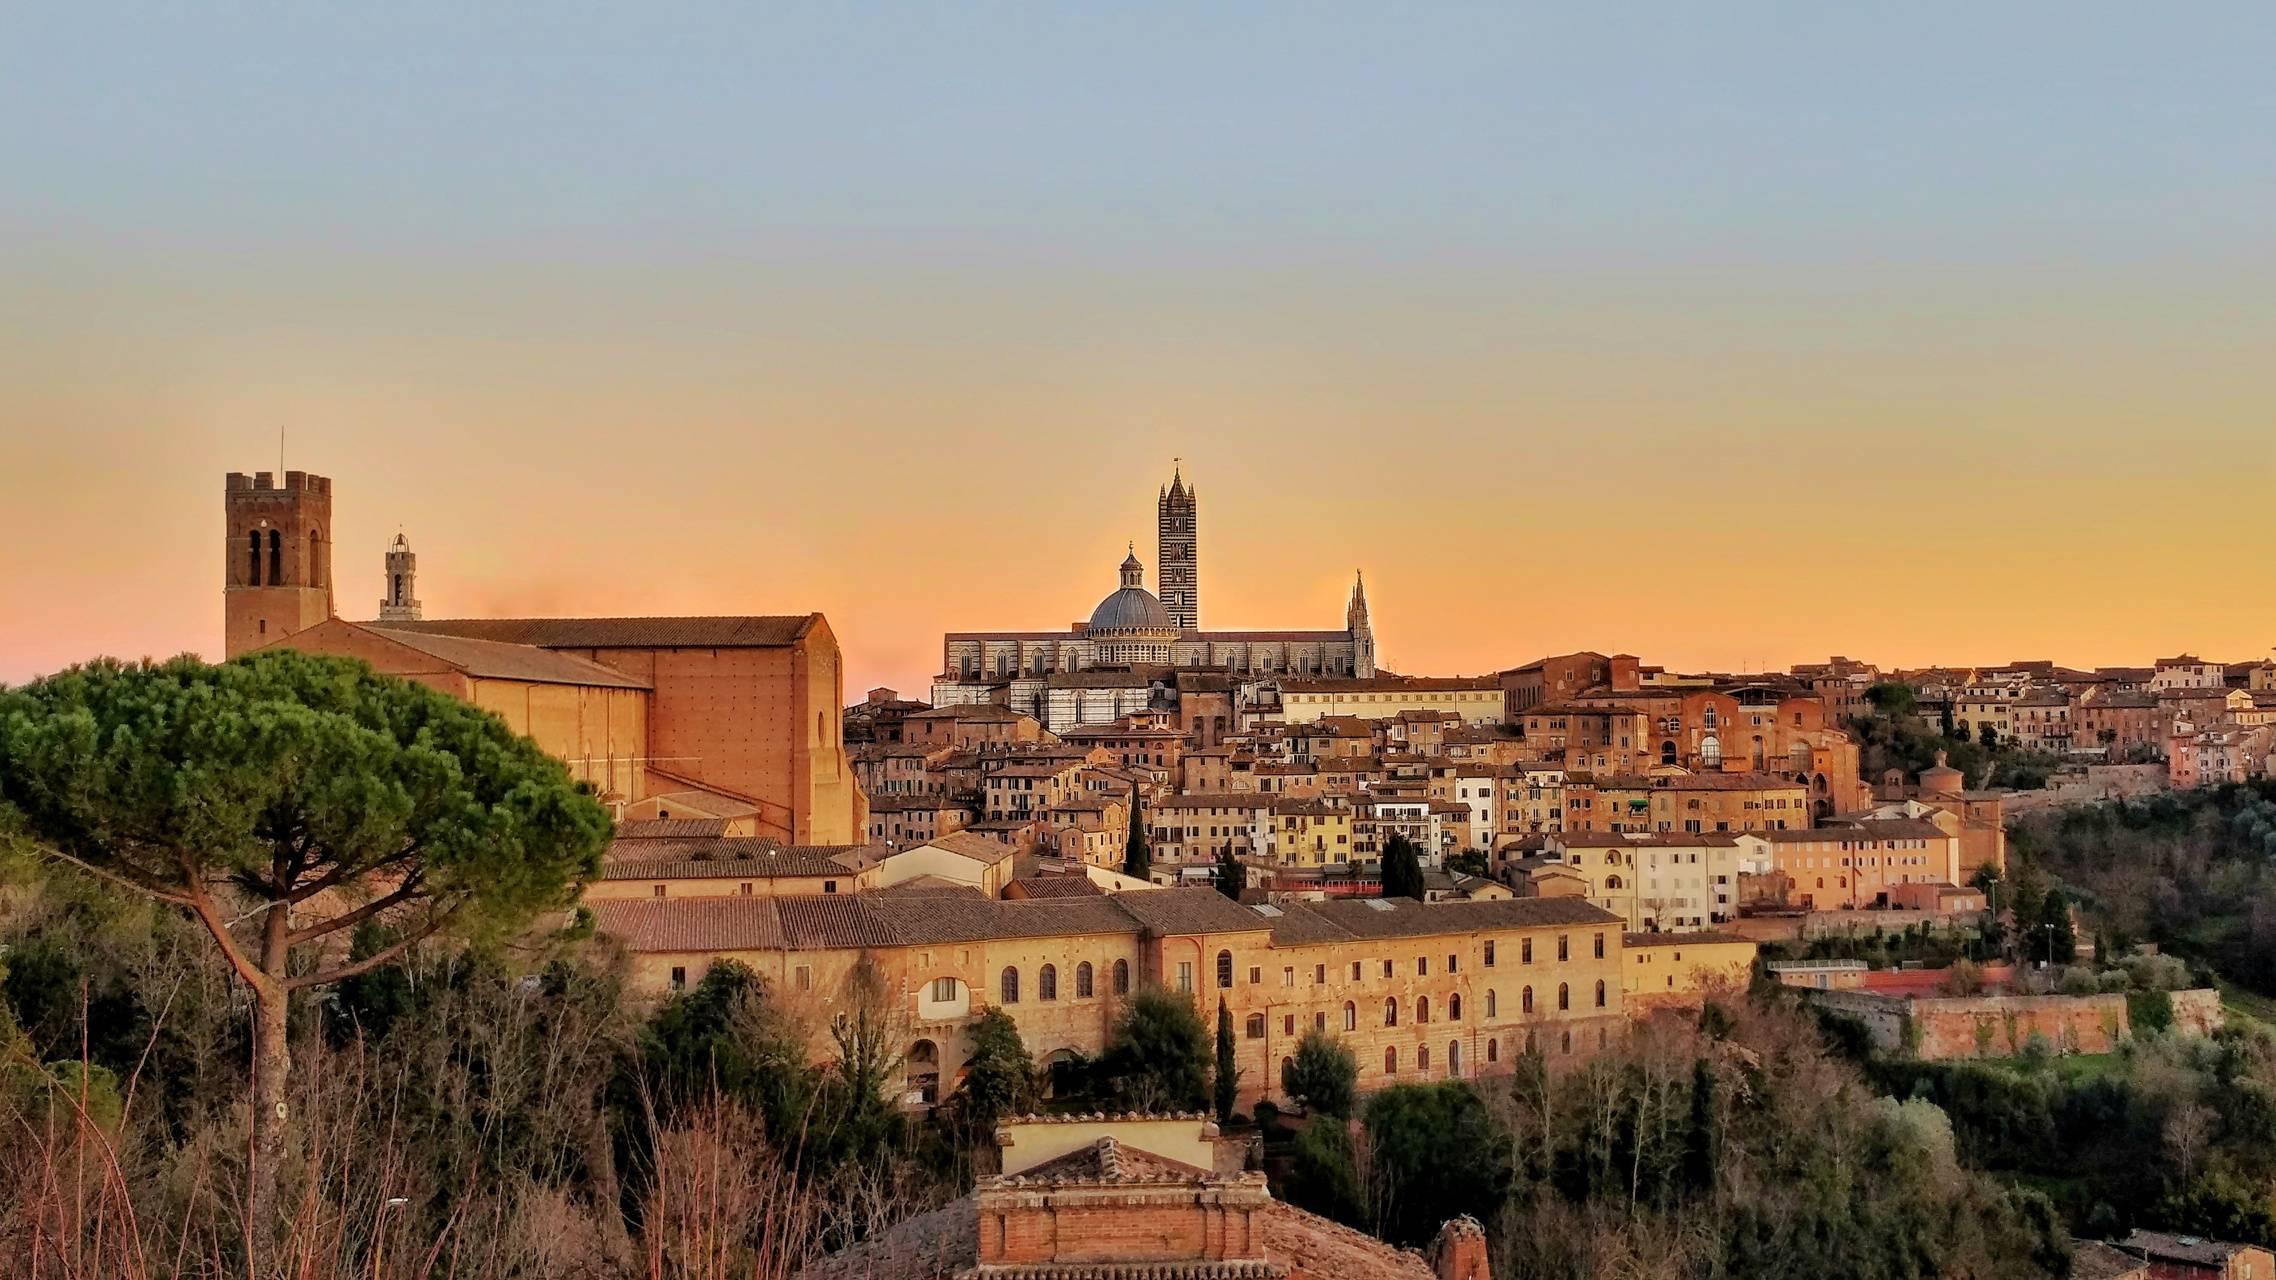 Wiew of Siena